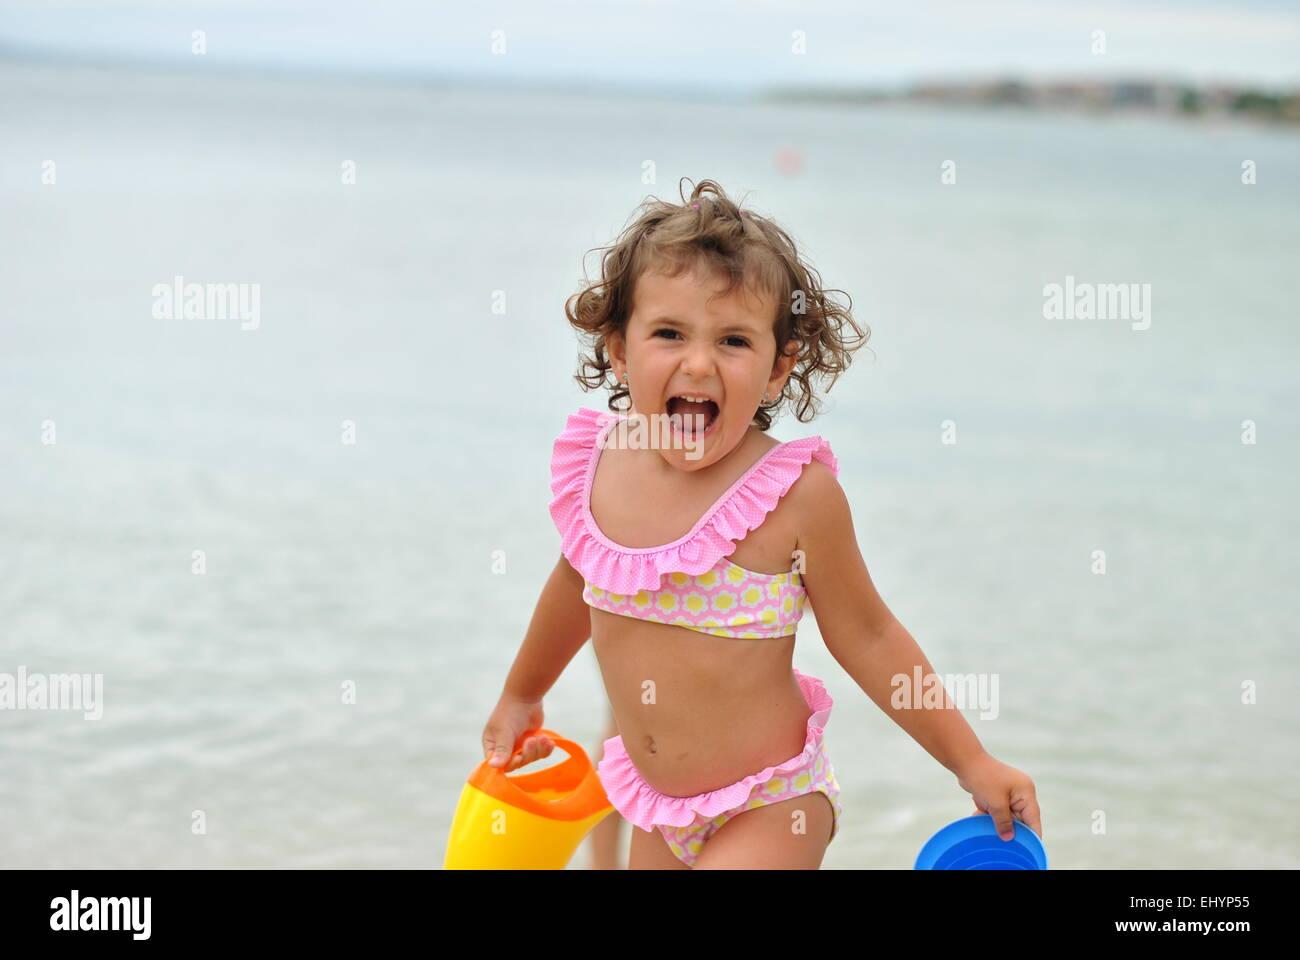 Girl in pink bikini jouant sur la plage Photo Stock